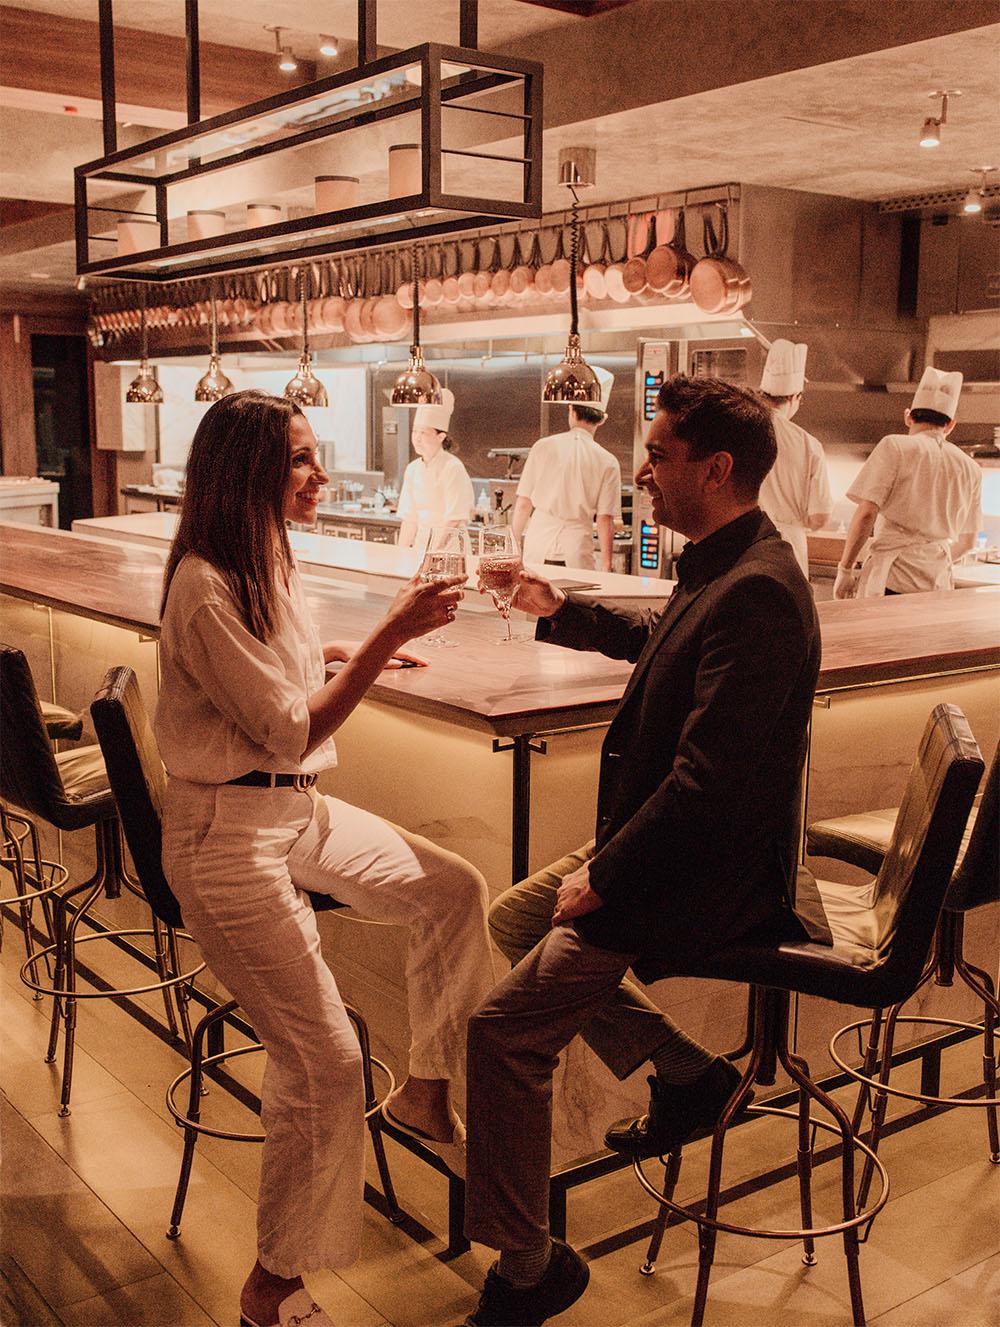 Brooklyn Fare, Michelin Restaurant, Chefs Table at Brooklyn Fare